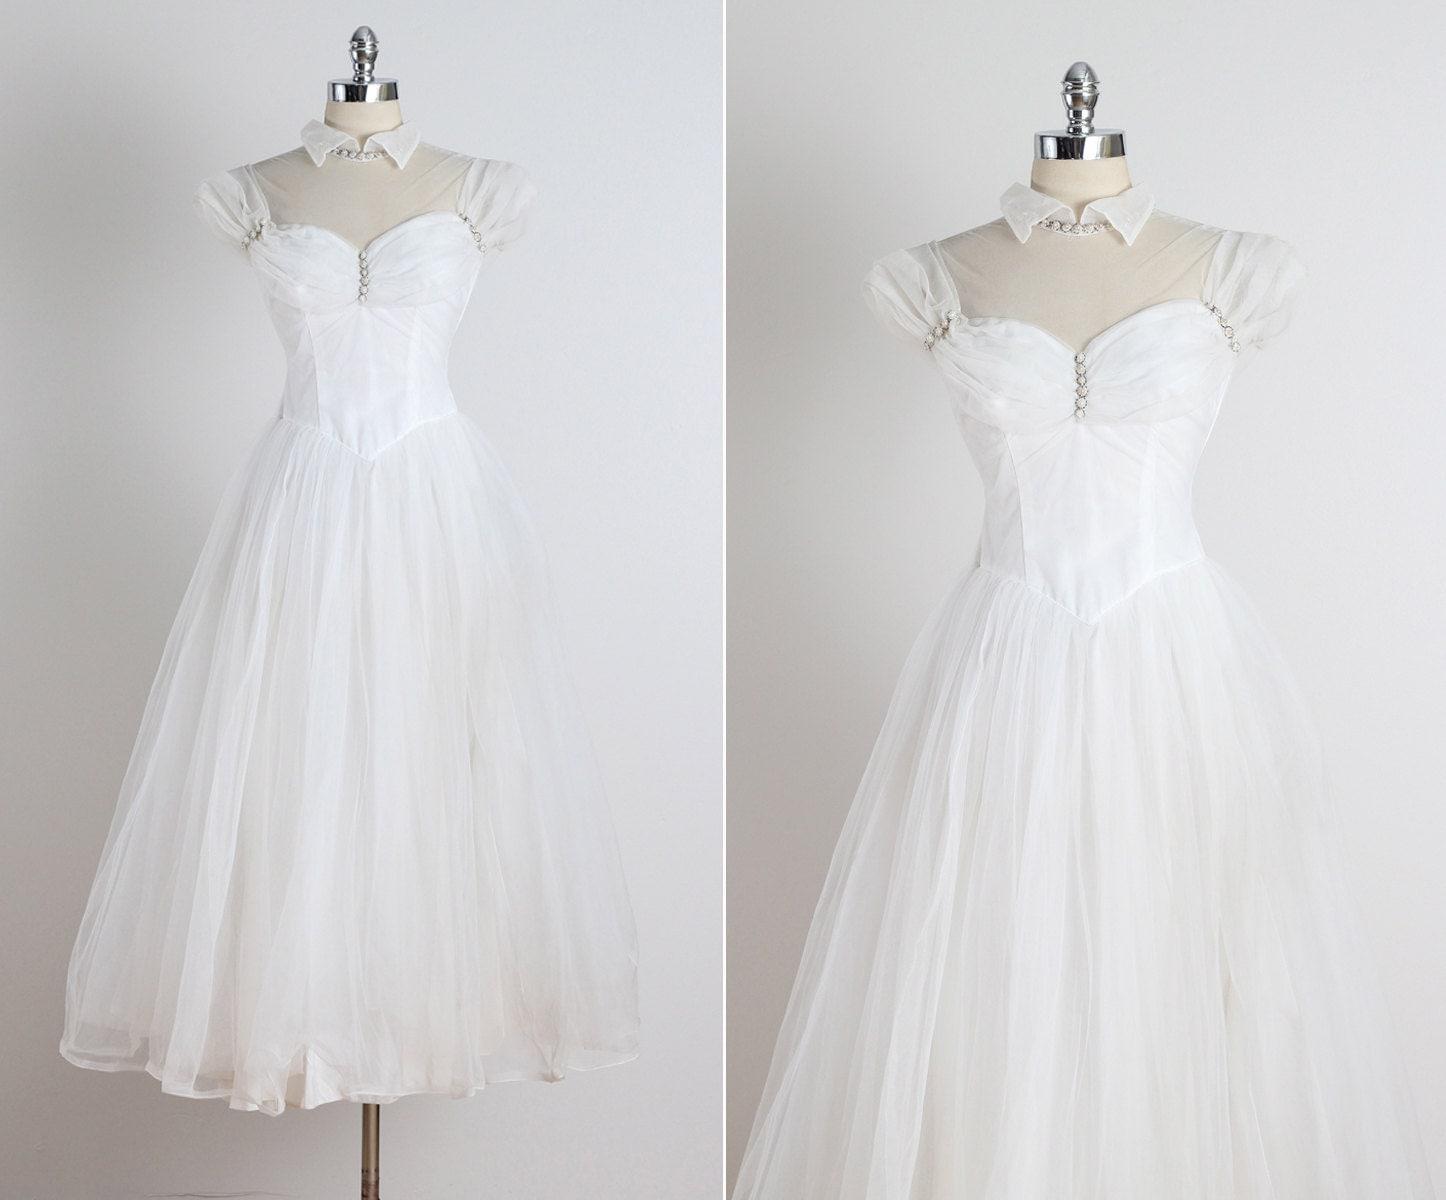 Wedded Bliss Vintage 1950s Wedding Dress Vintage Beaded